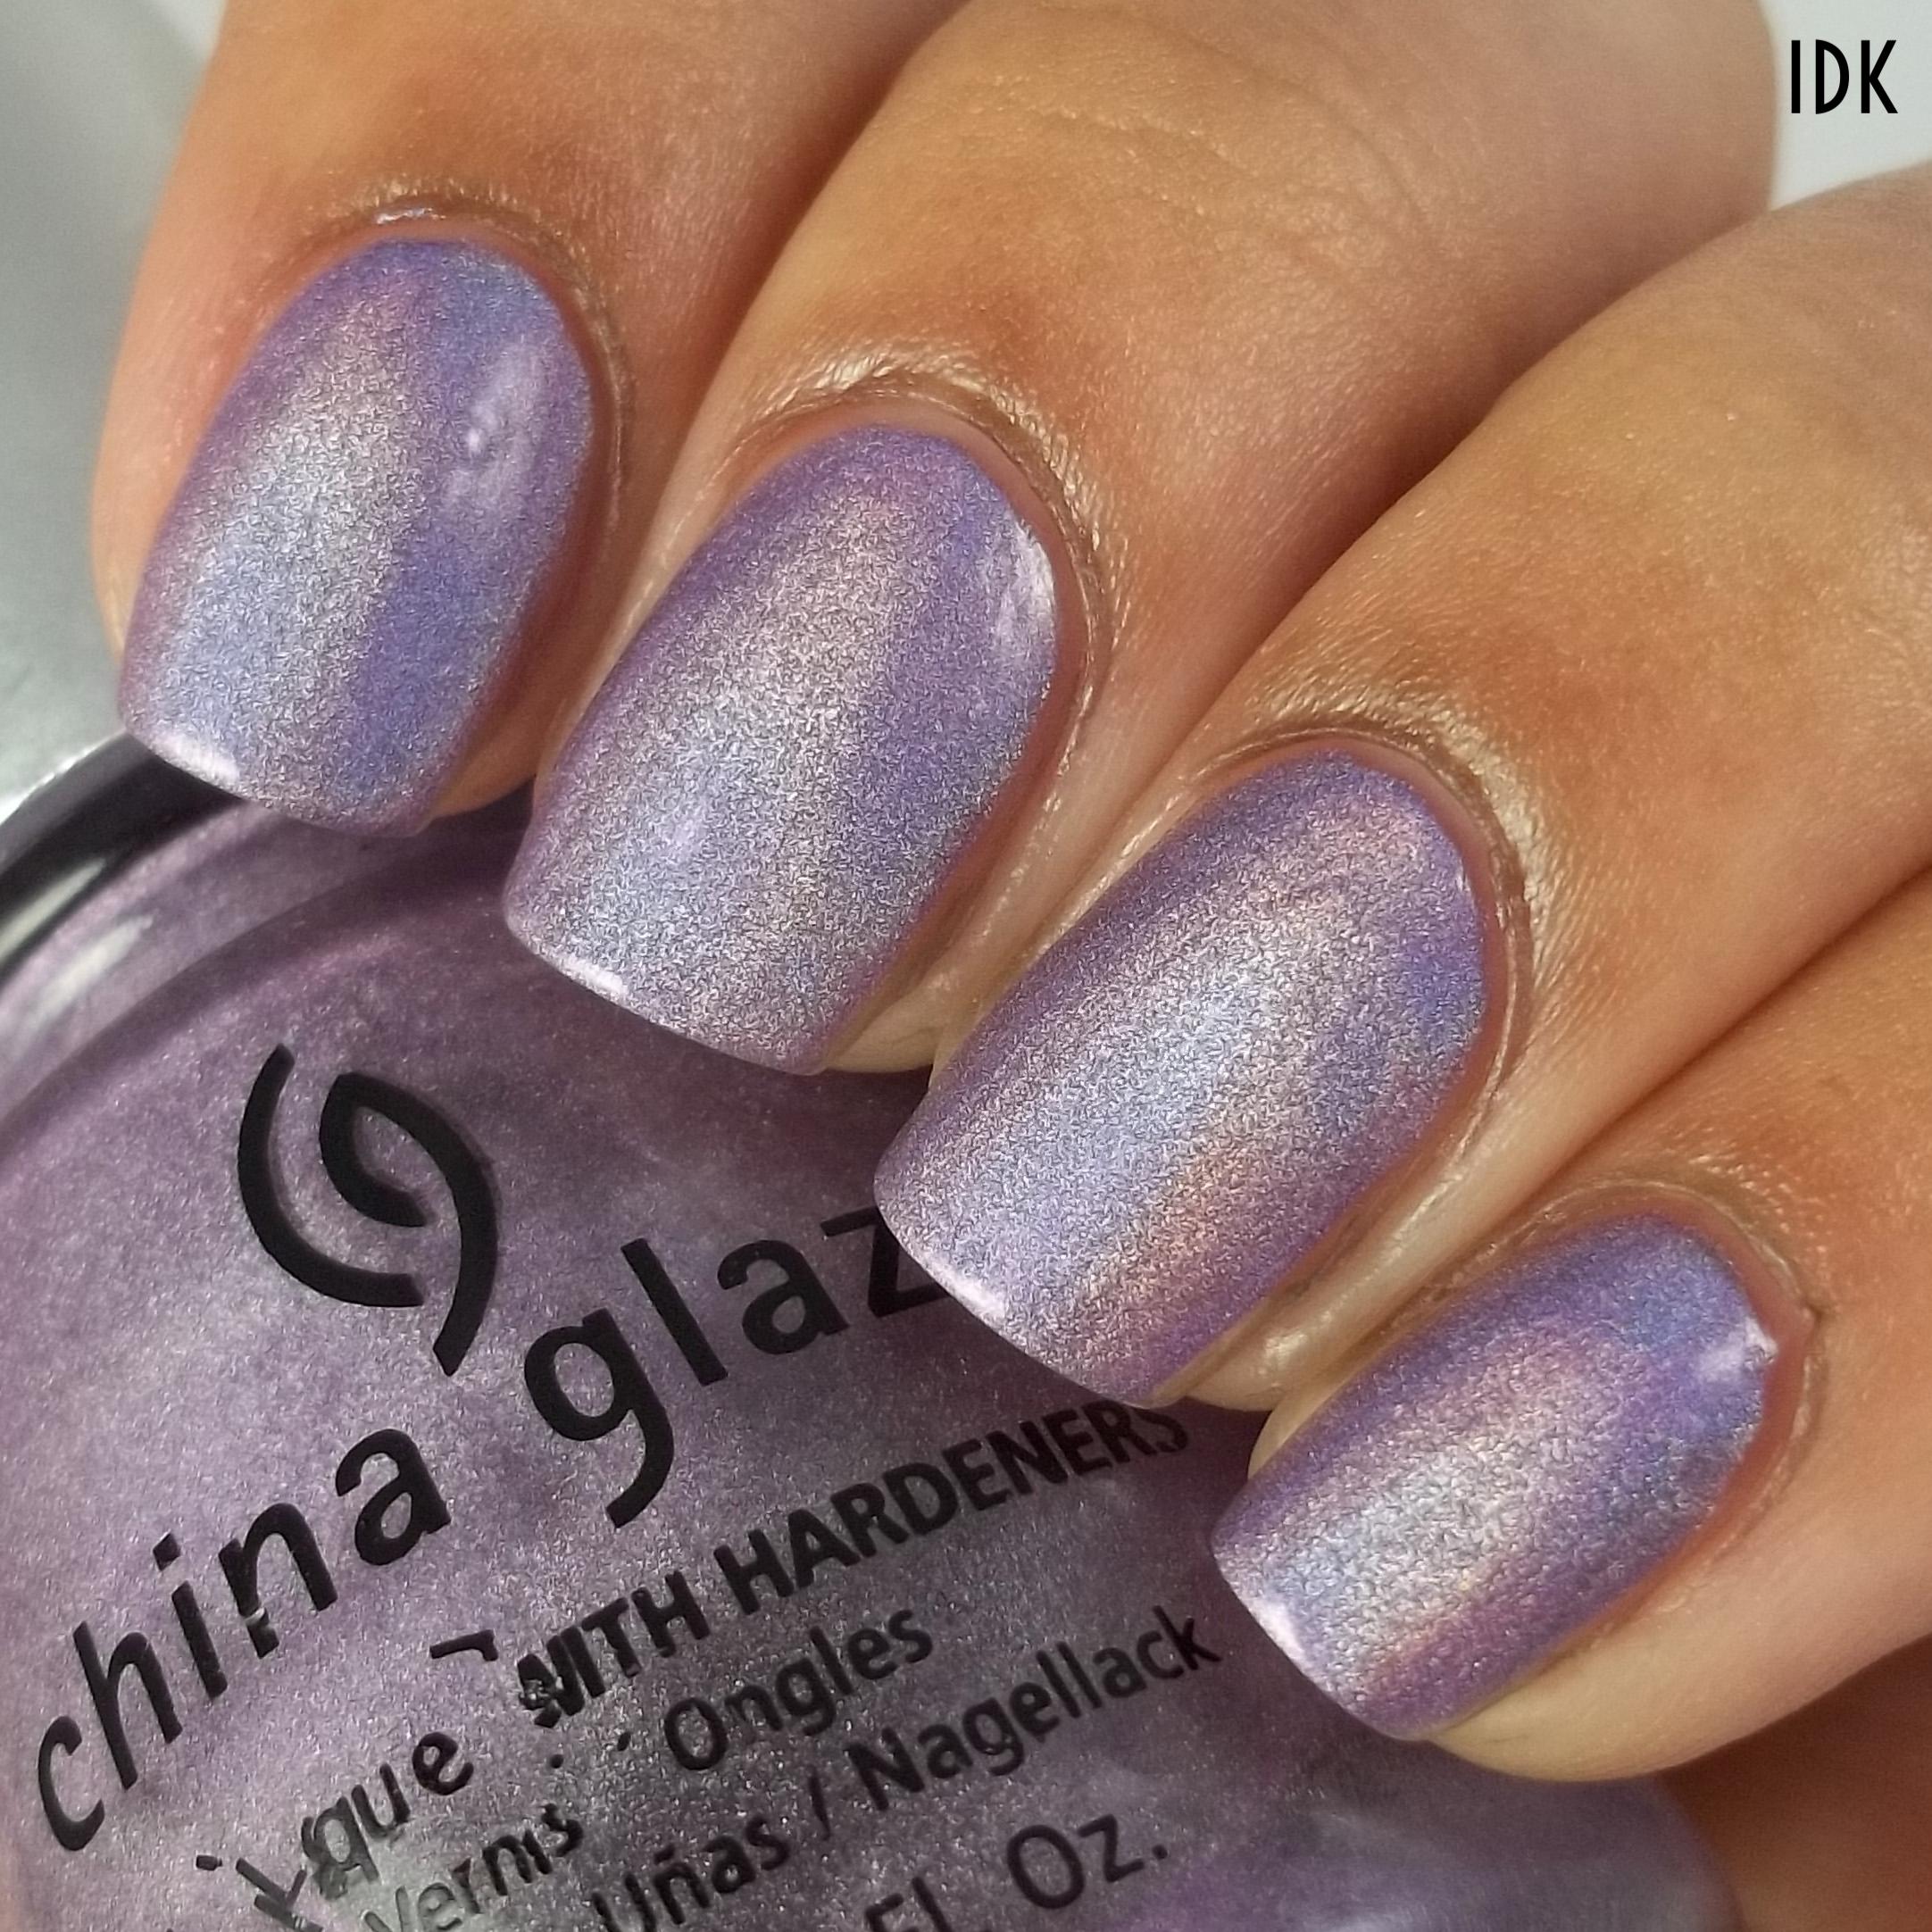 China Glaze OMG - IDK.jpg